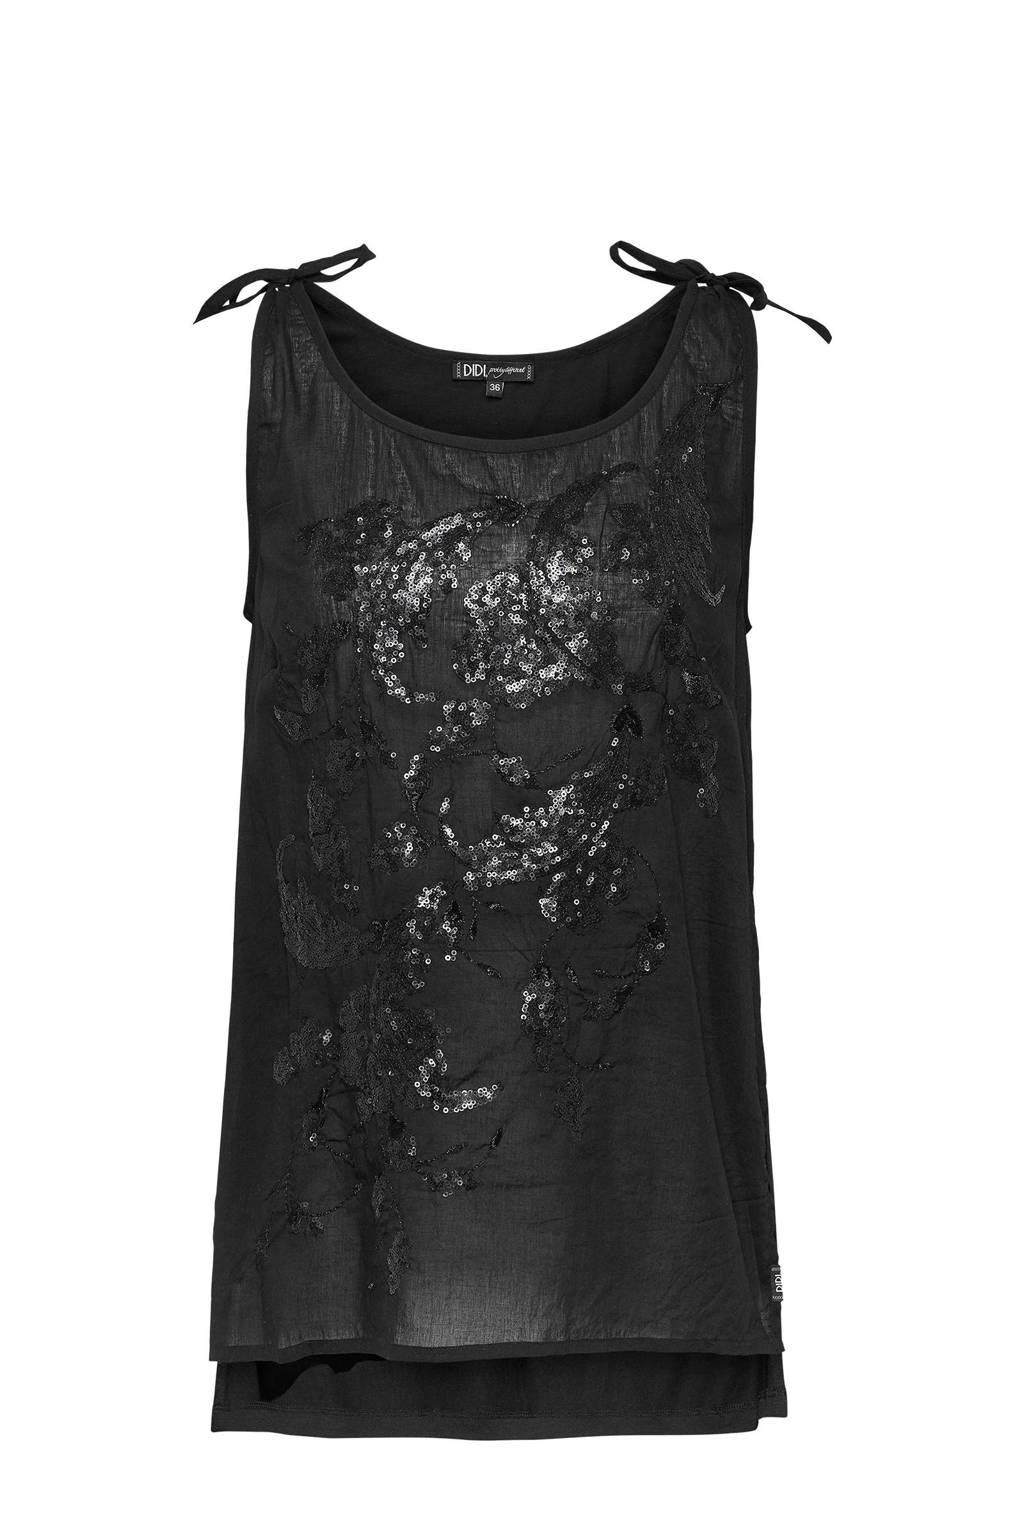 Didi semi-transparante singlet met pailletten zwart, Zwart